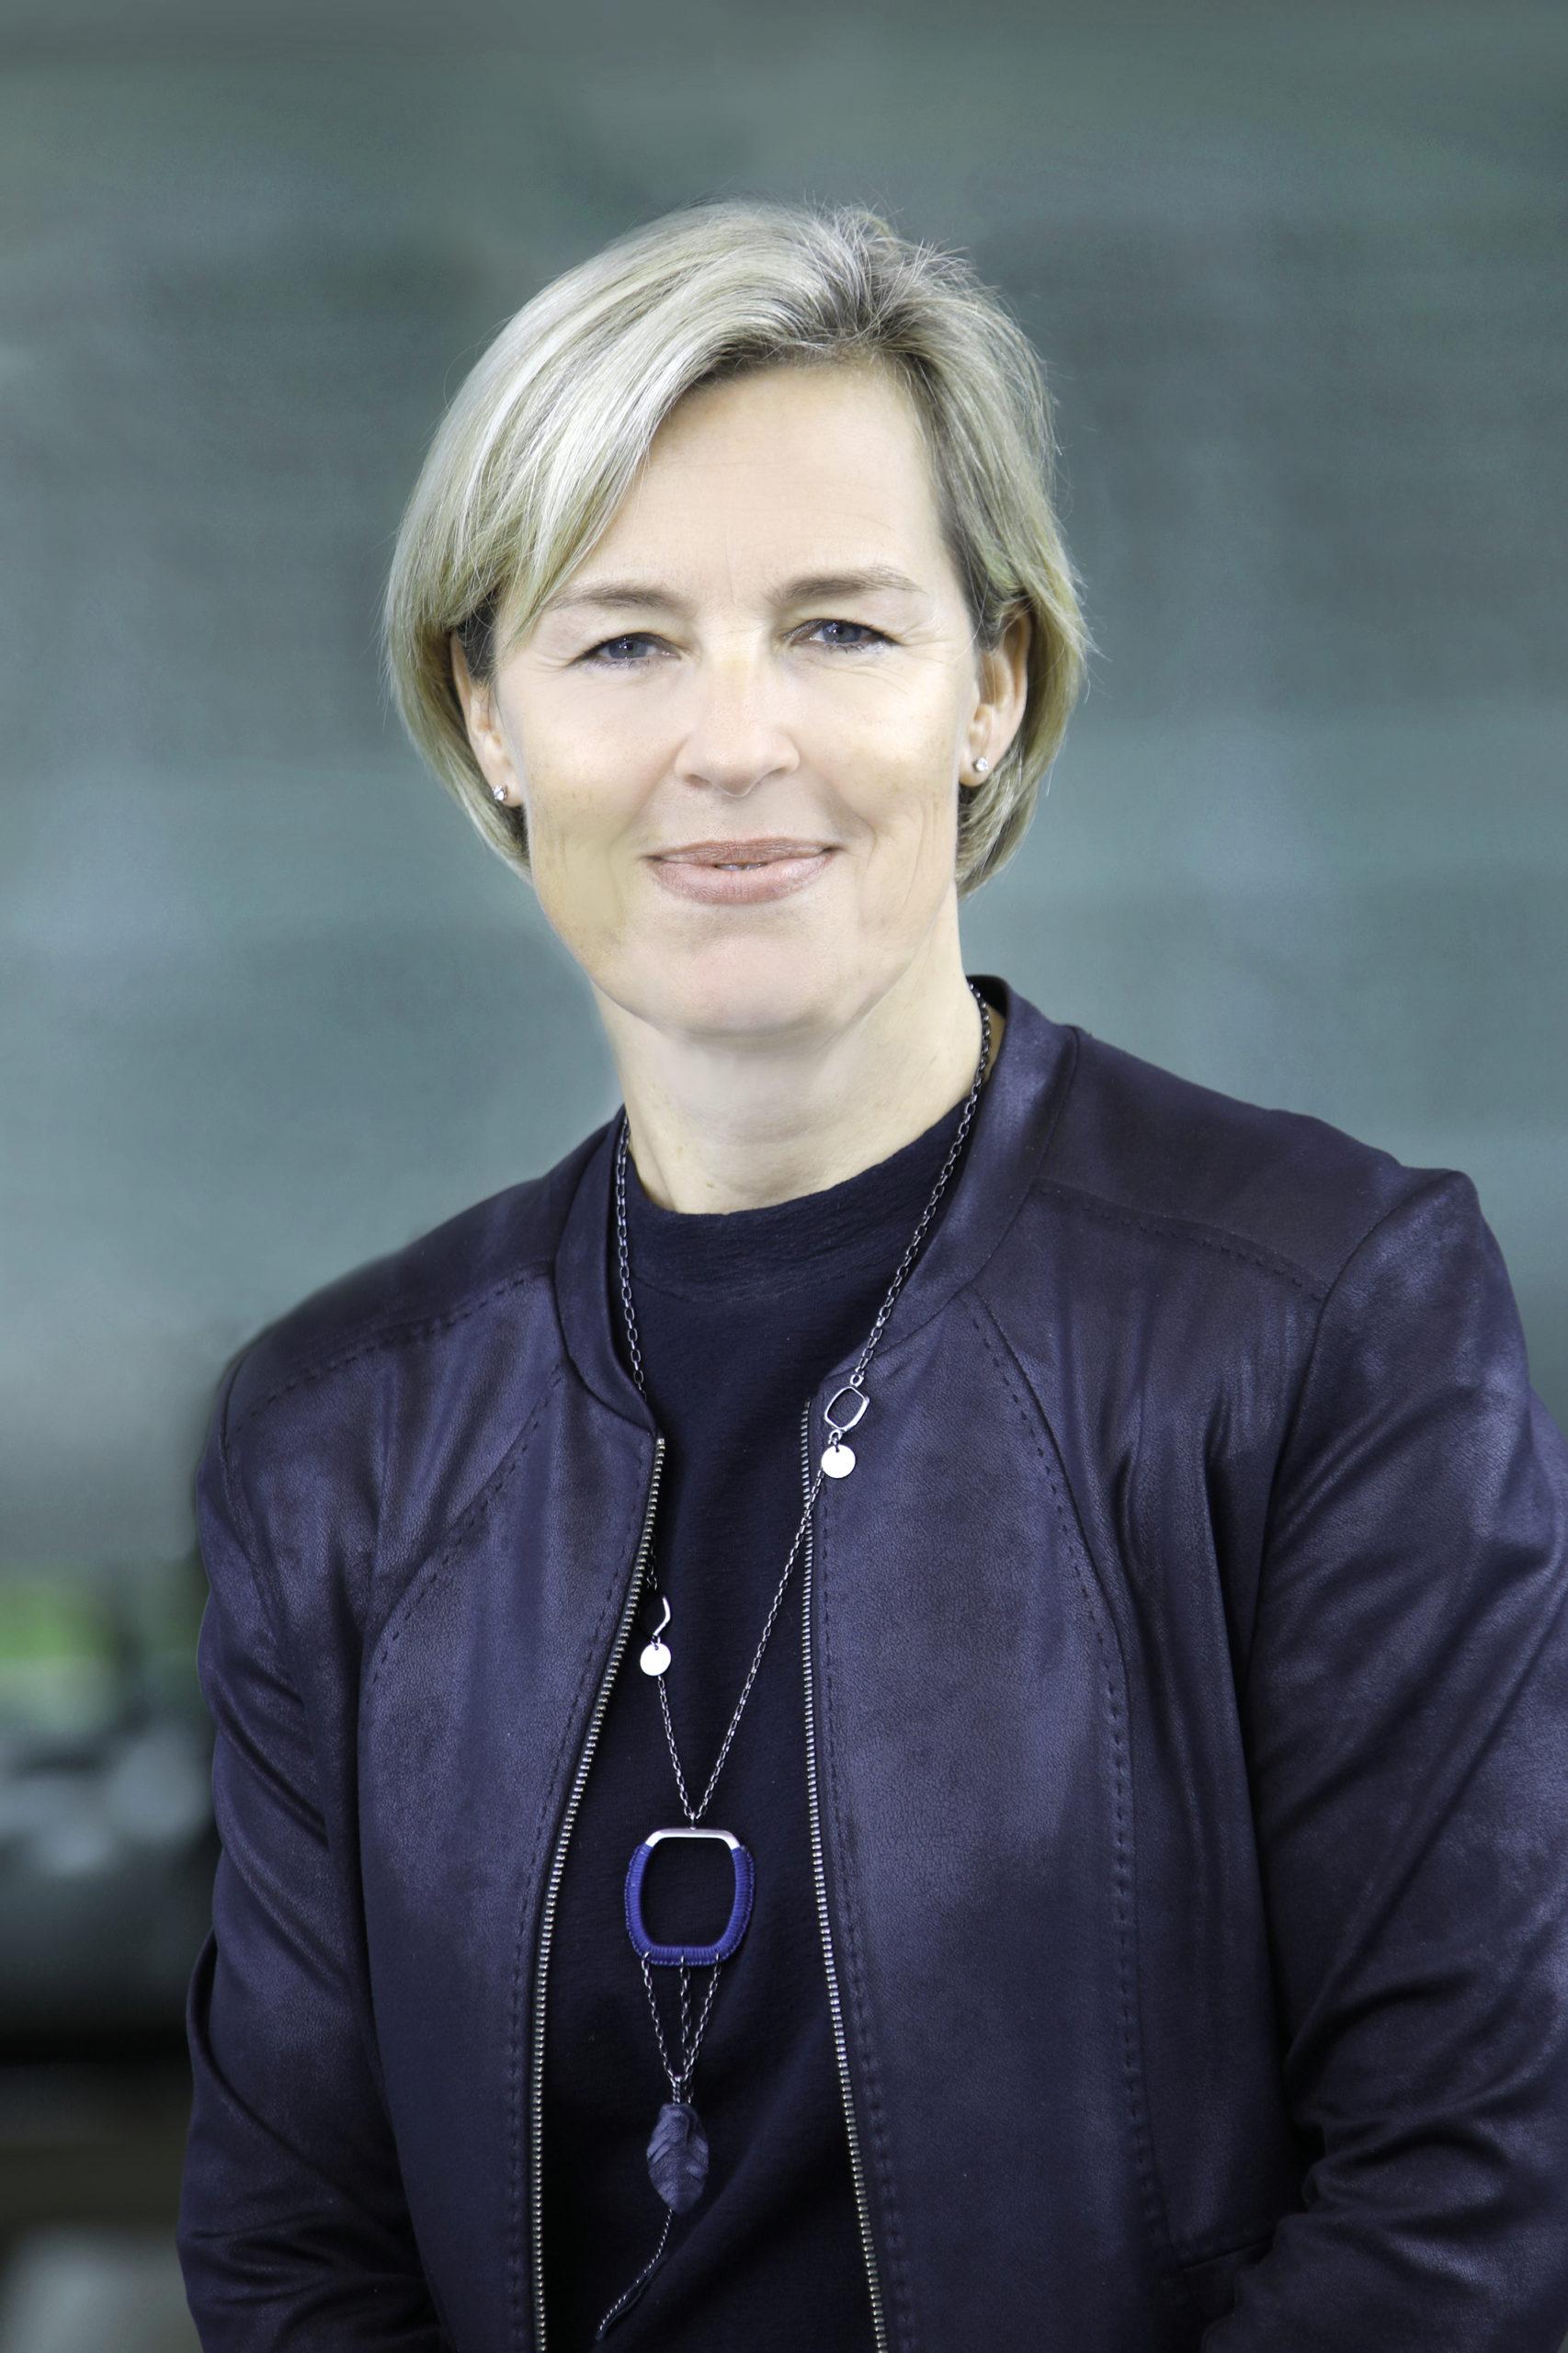 Karine Duquesne